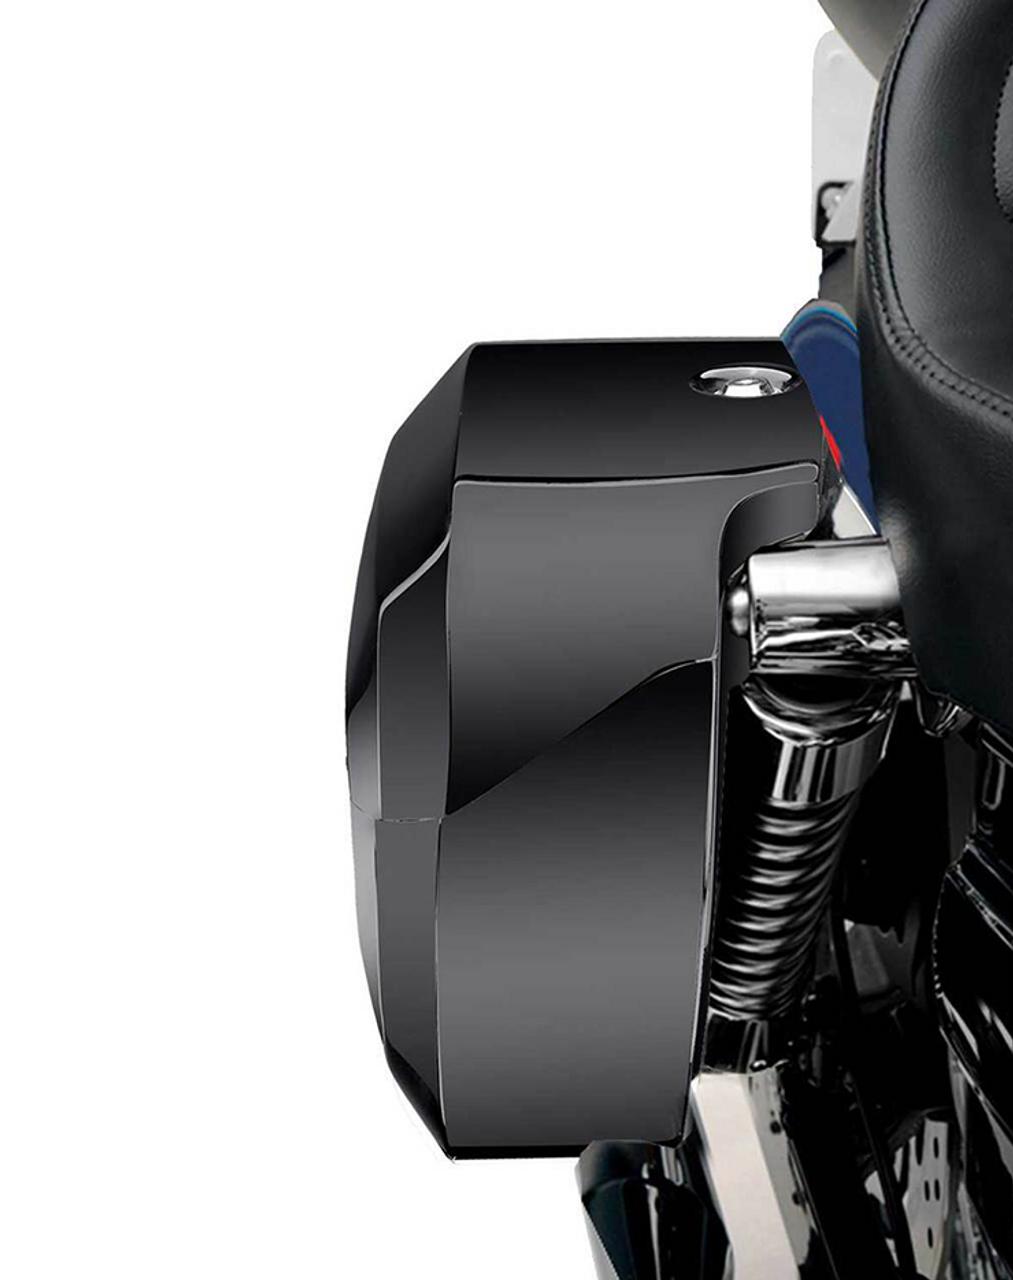 Kawasaki Vulcan 800 Viking Lamellar Large Spear Shock Cutout Hard Saddlebags Shock Cutout View